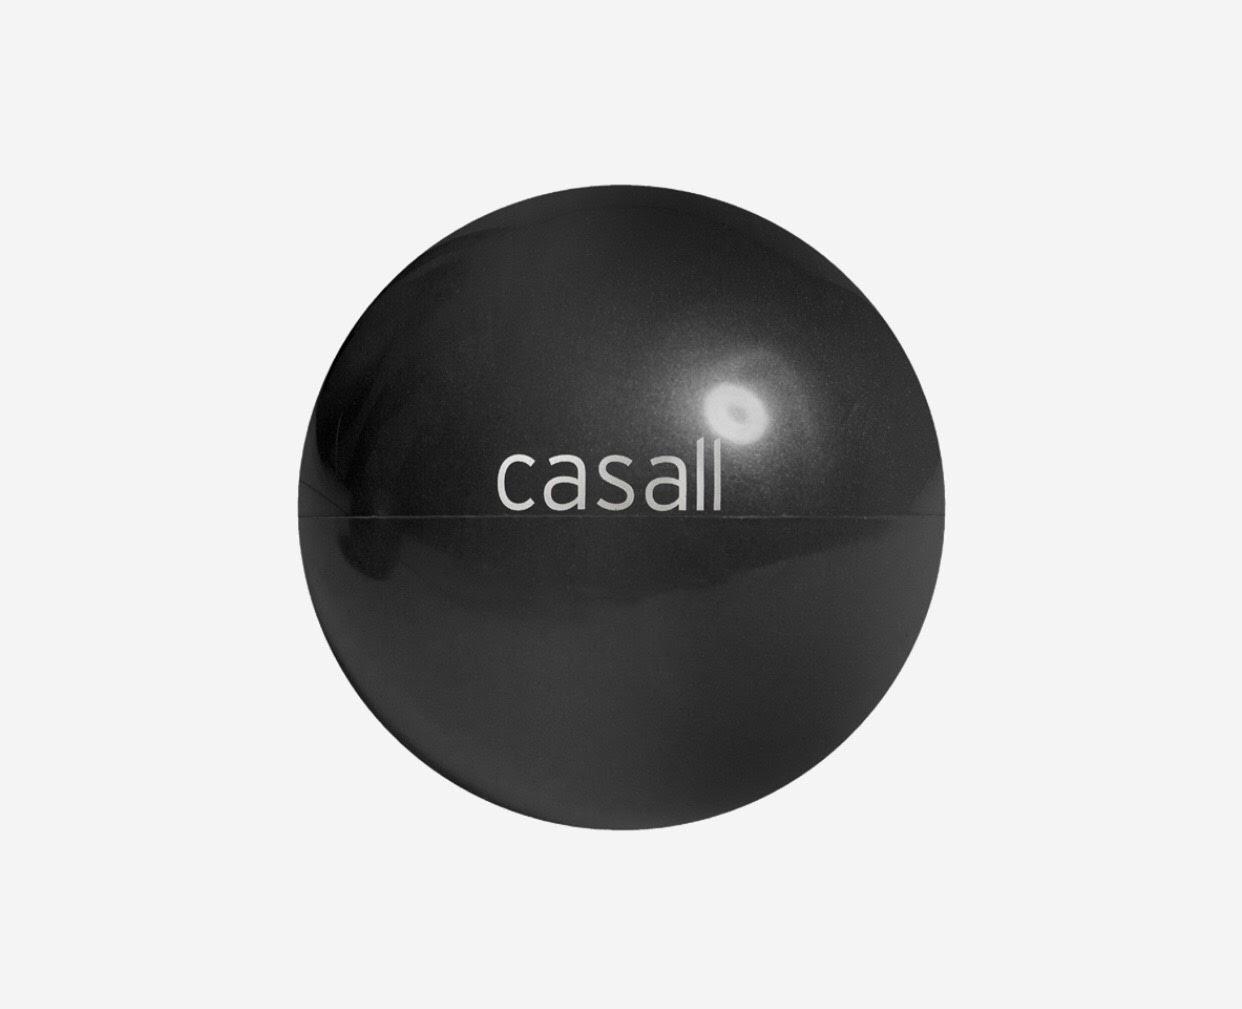 Pilatesboll, Casall